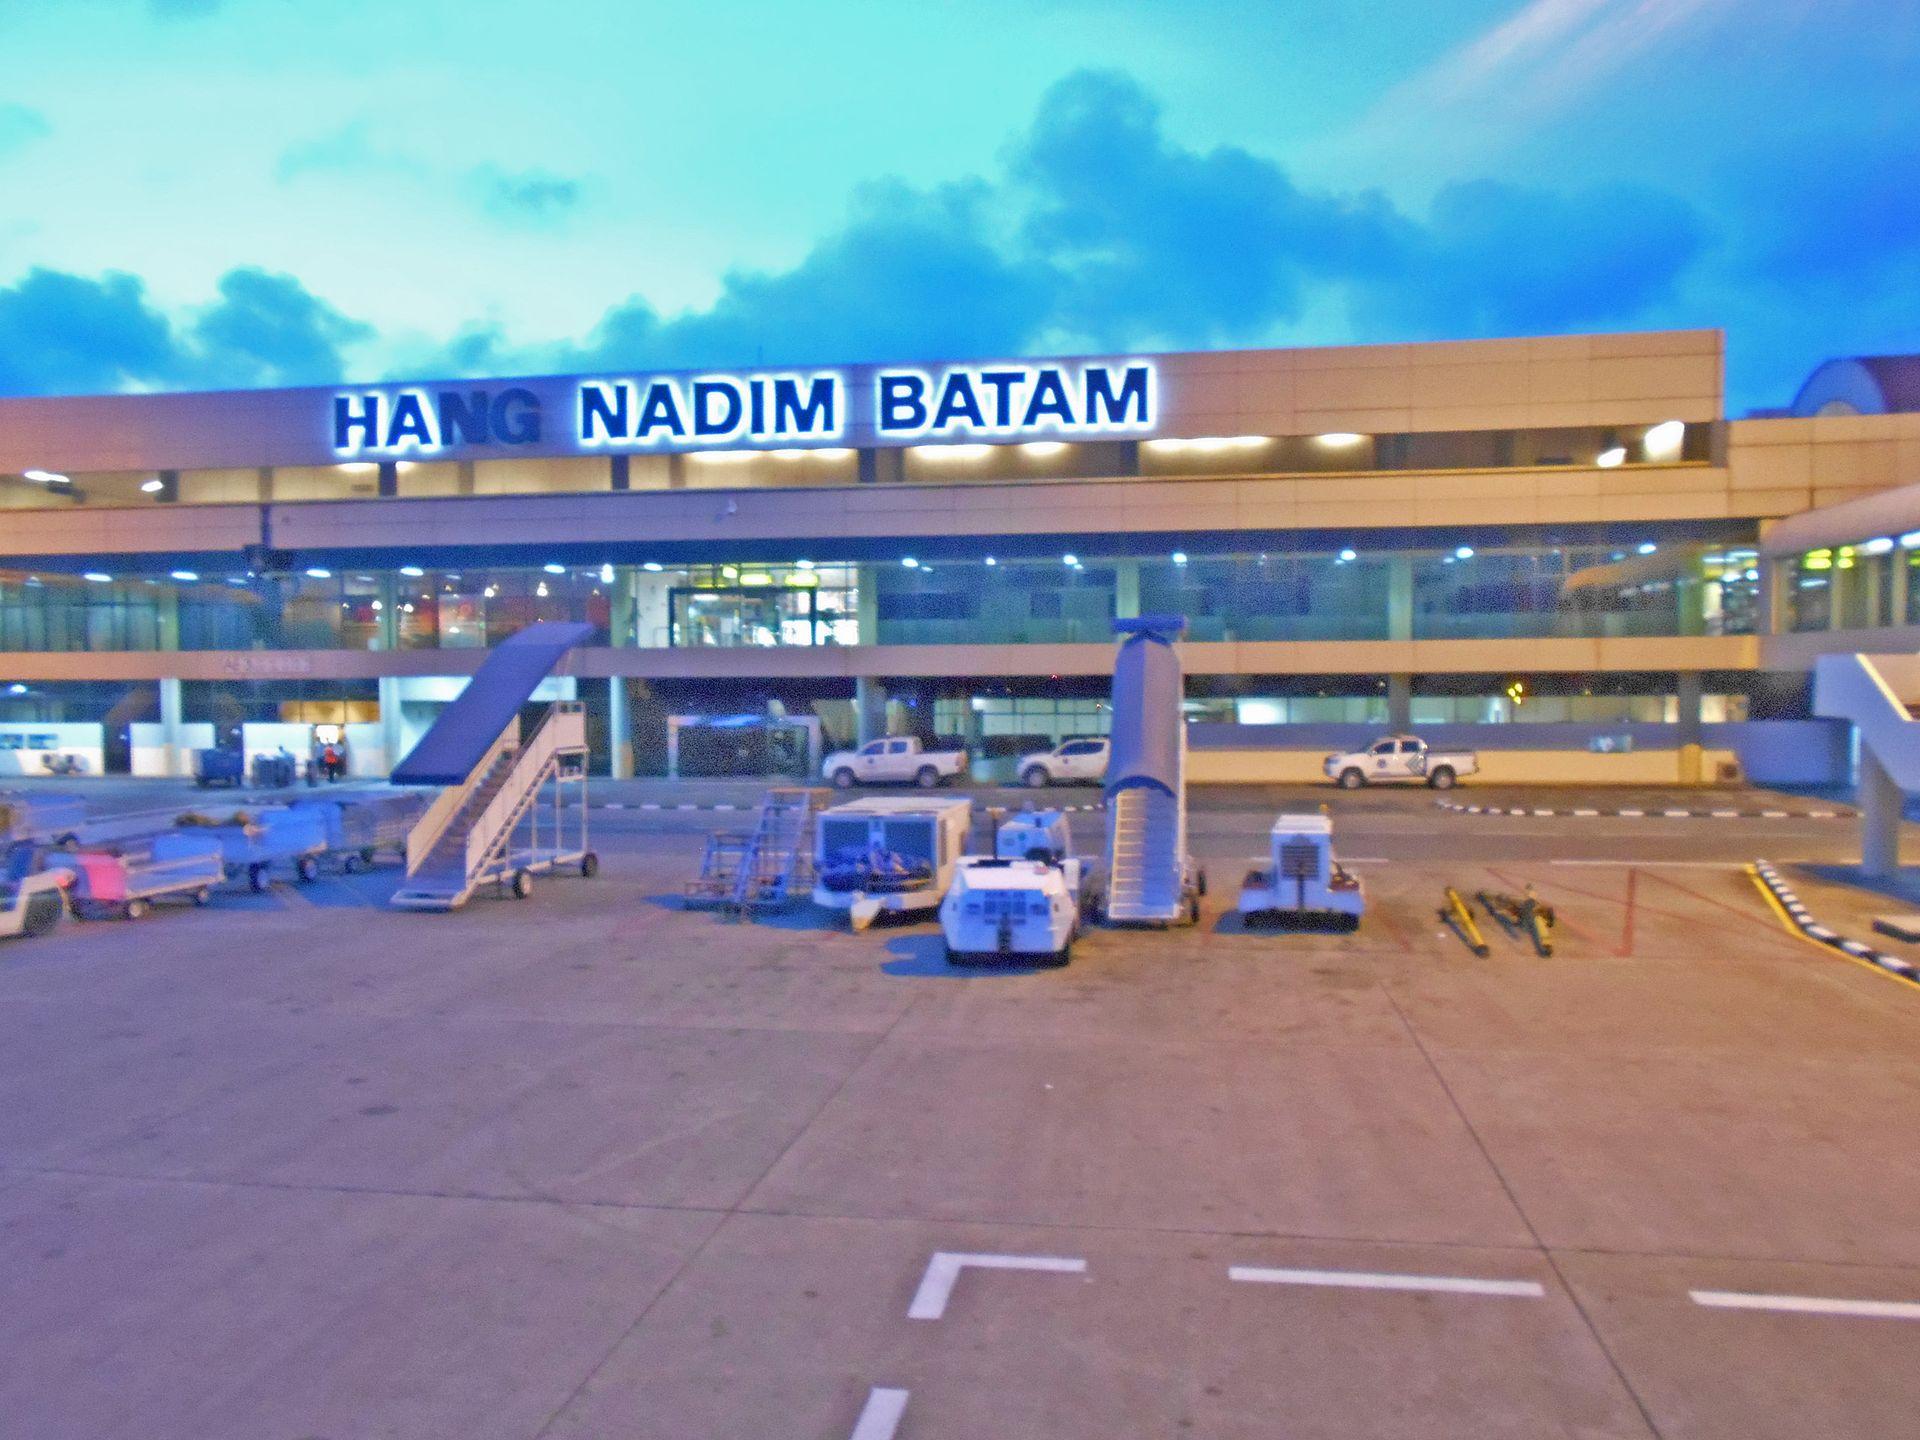 Bandar Udara Internasional Hang Nadim - Wikipedia bahasa Indonesia ...